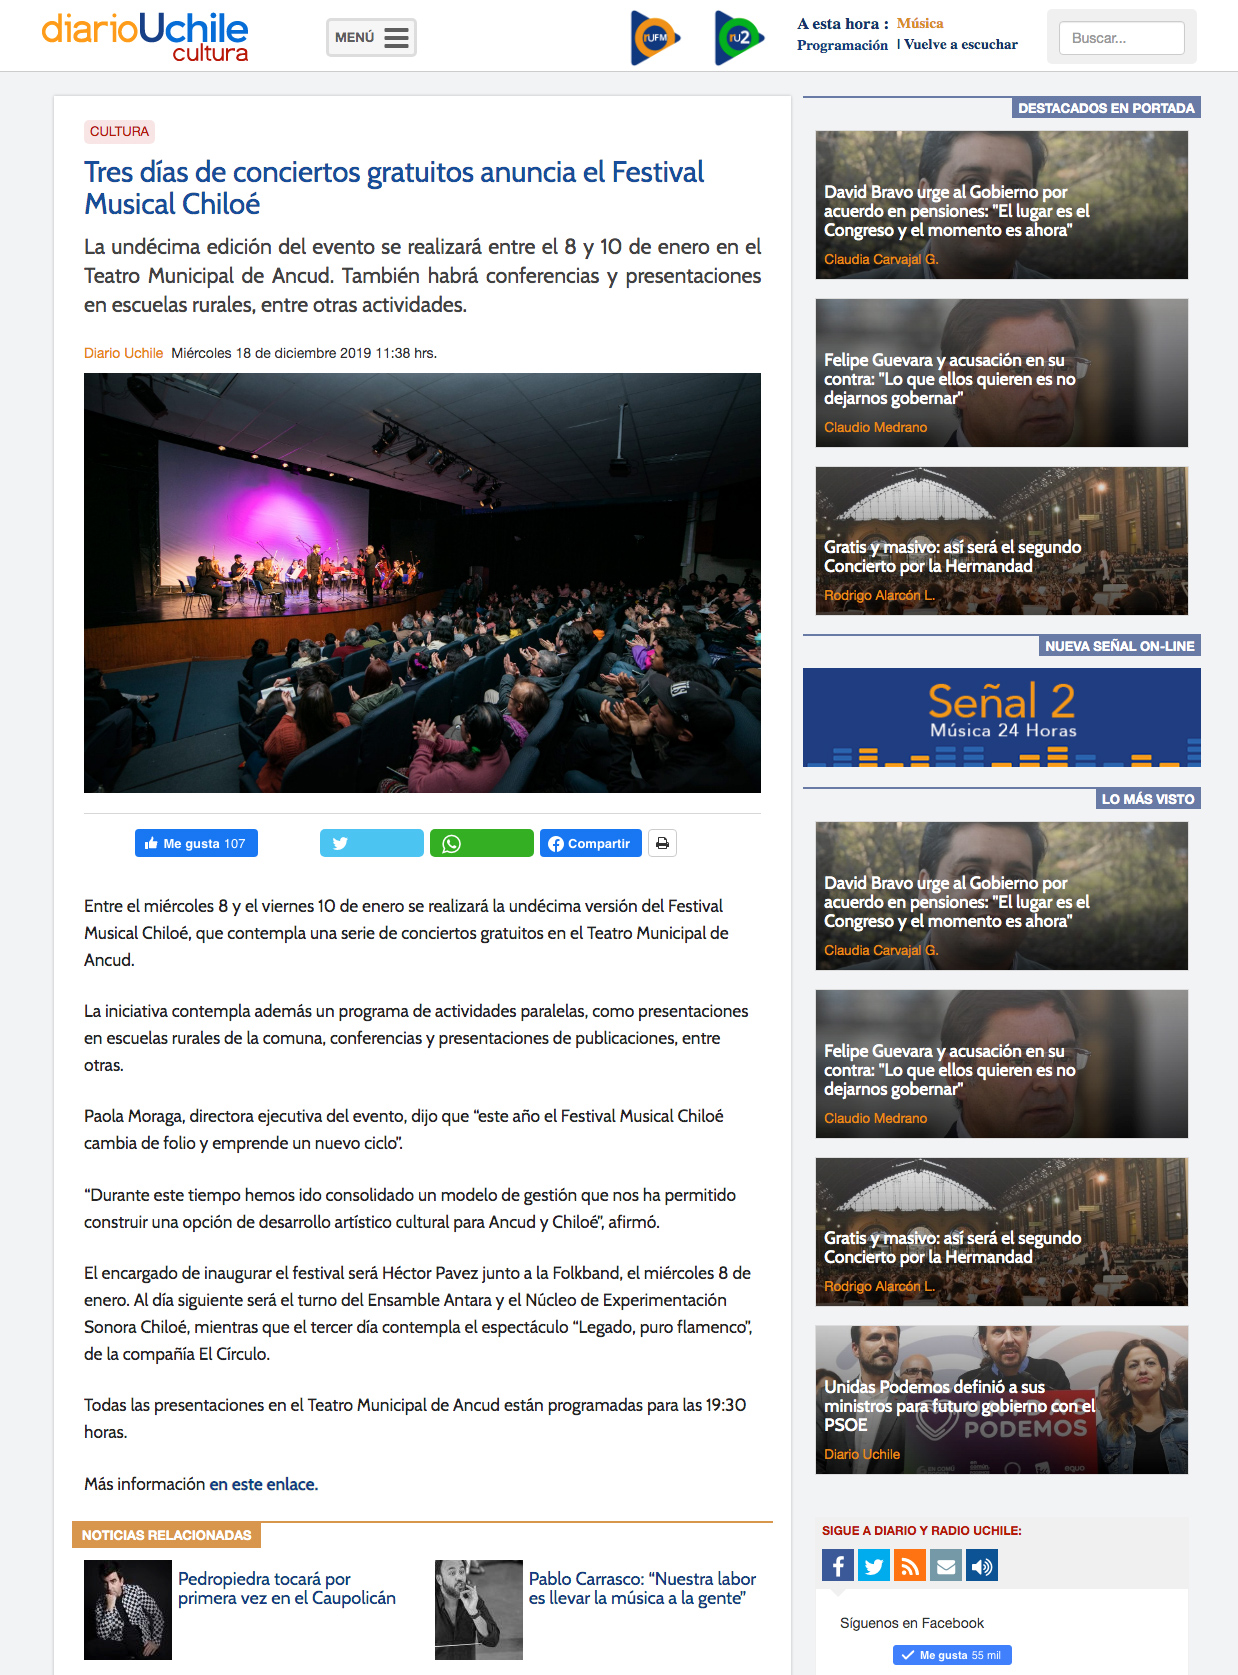 Diario-Uchile-18-12-2019